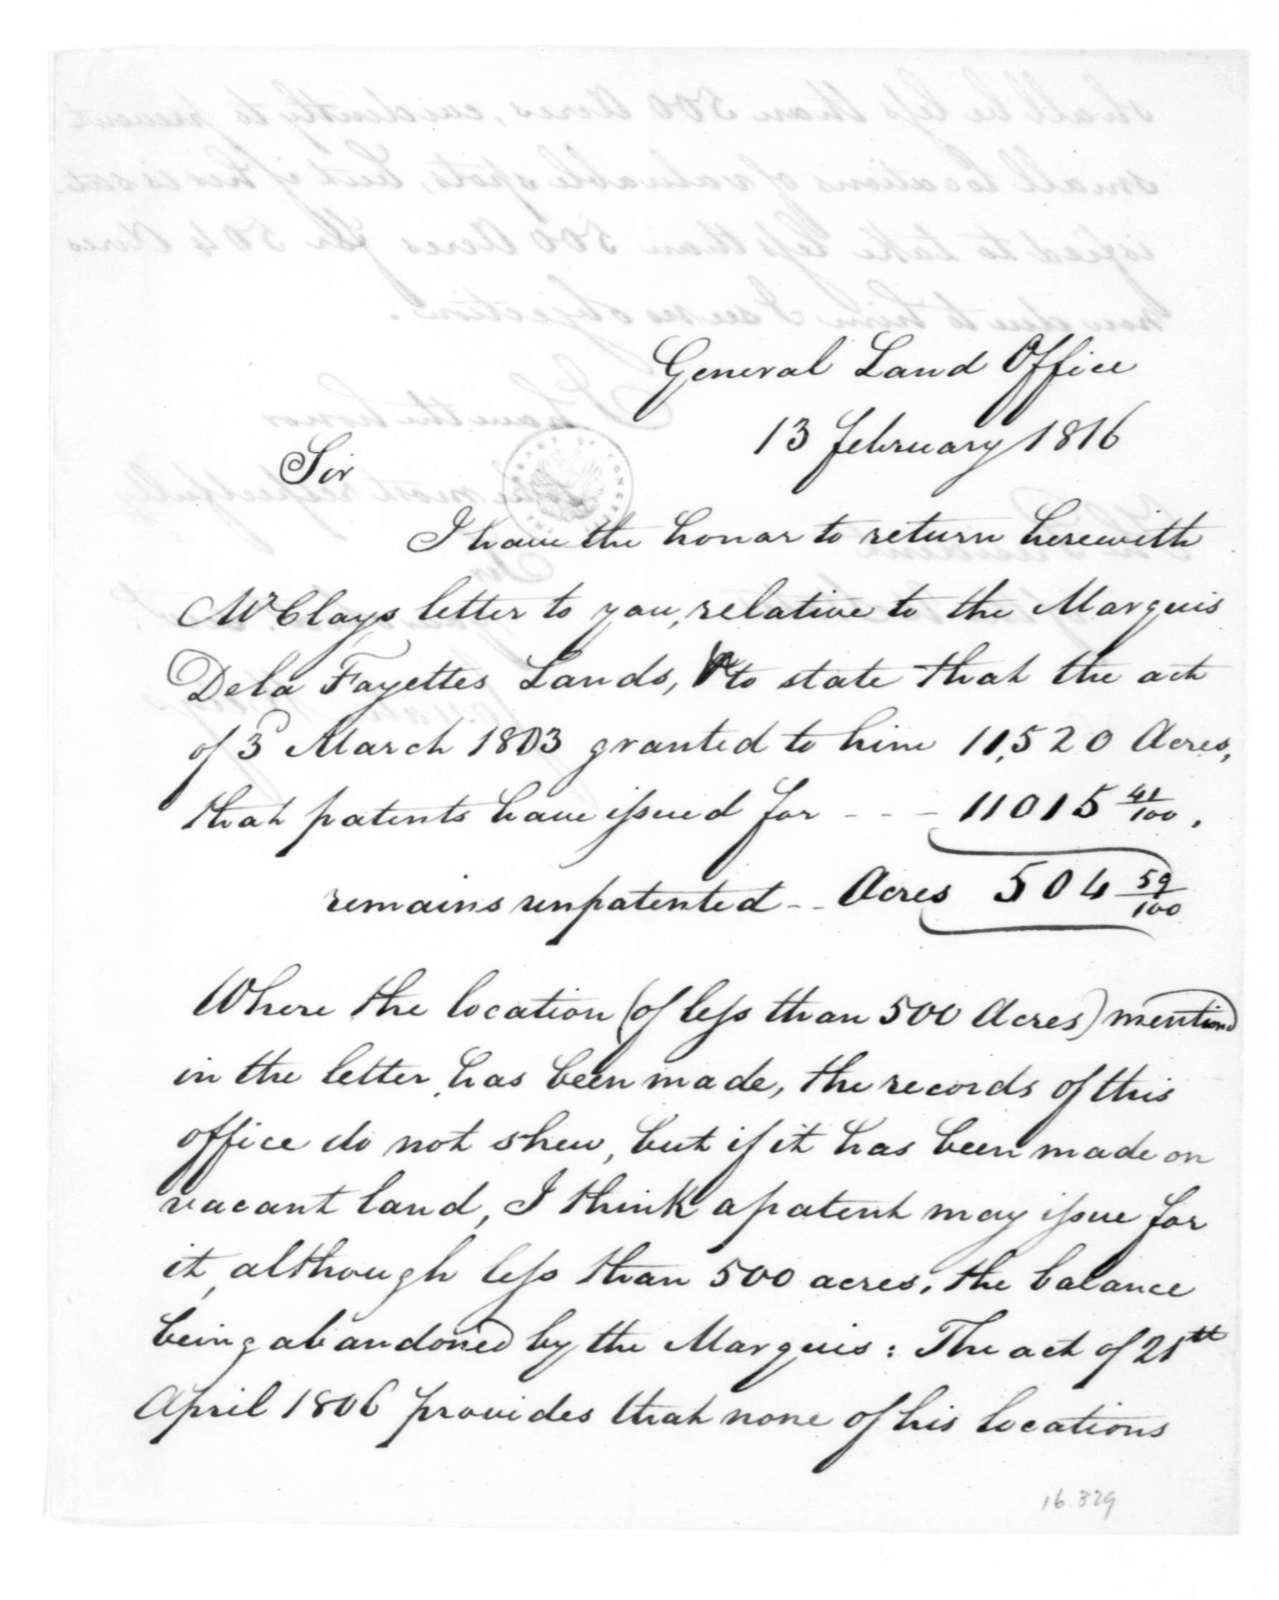 Josiah Meigs to James Madison, February 13, 1816.